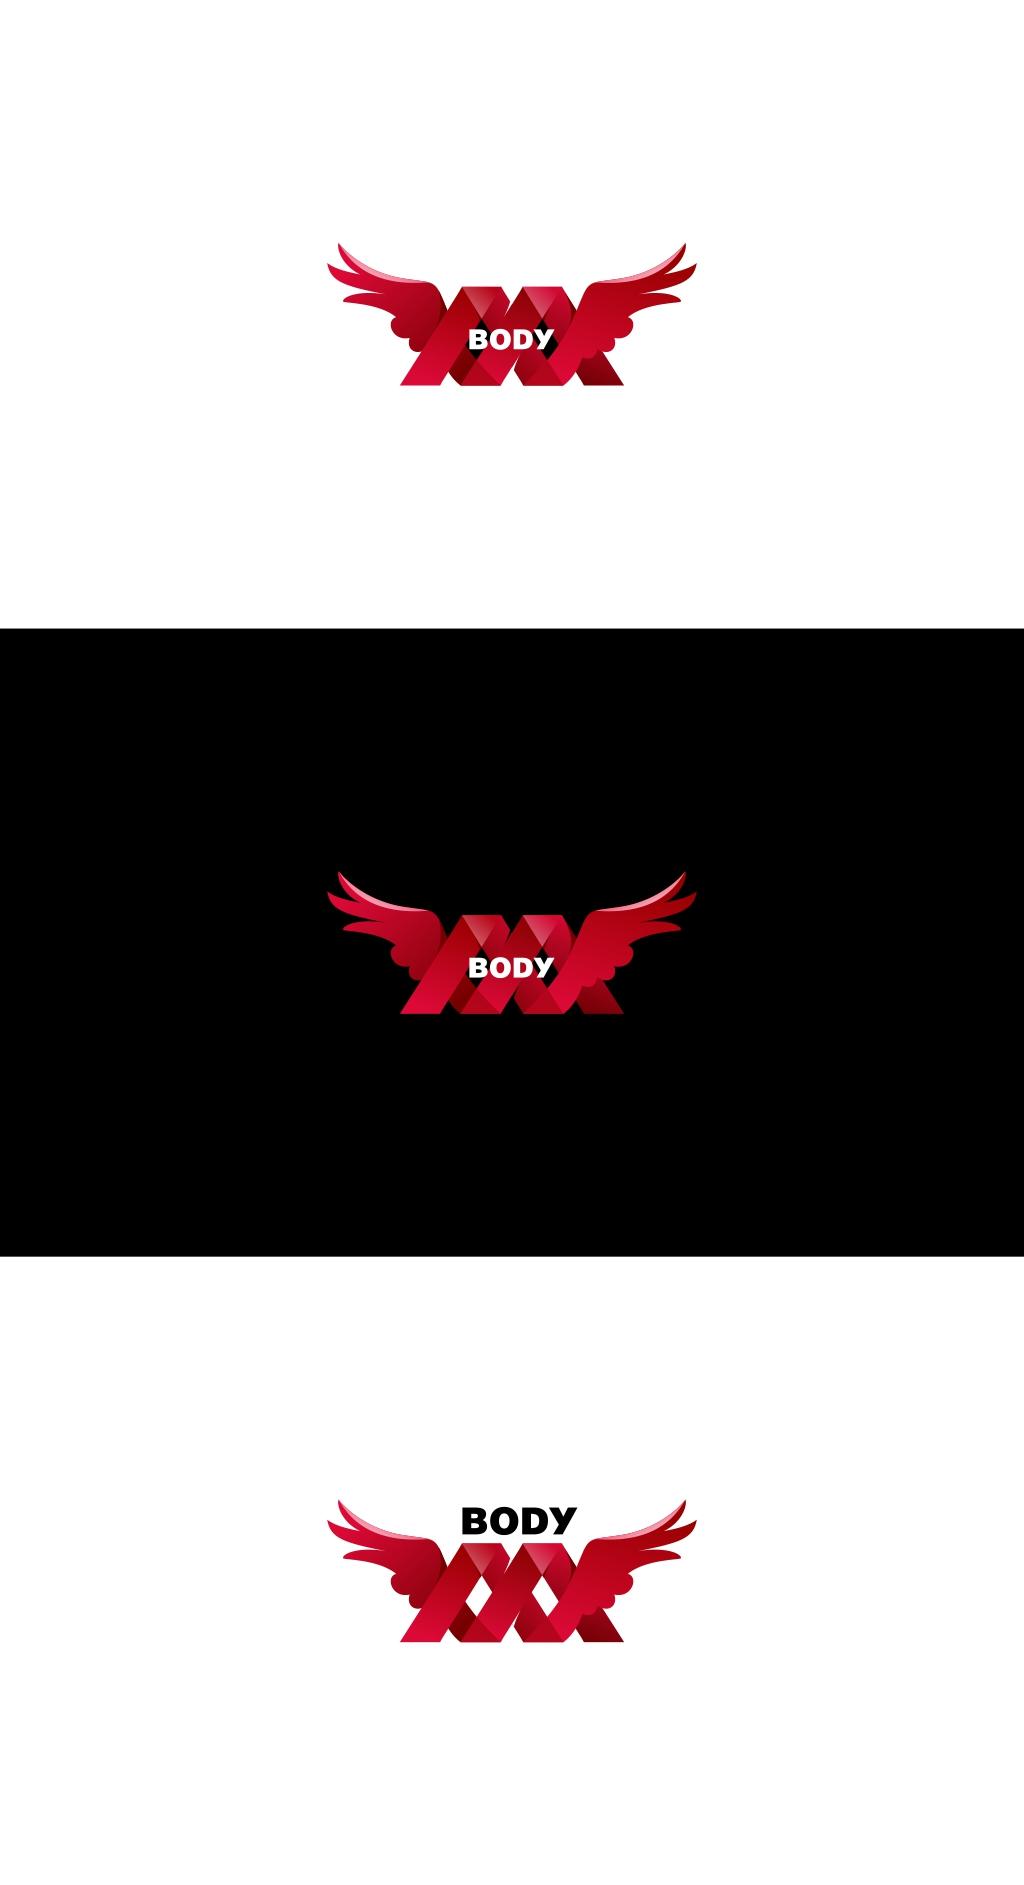 Разработка логотипа (видеоблог для моделей) фото f_1745b1e916f53452.jpg